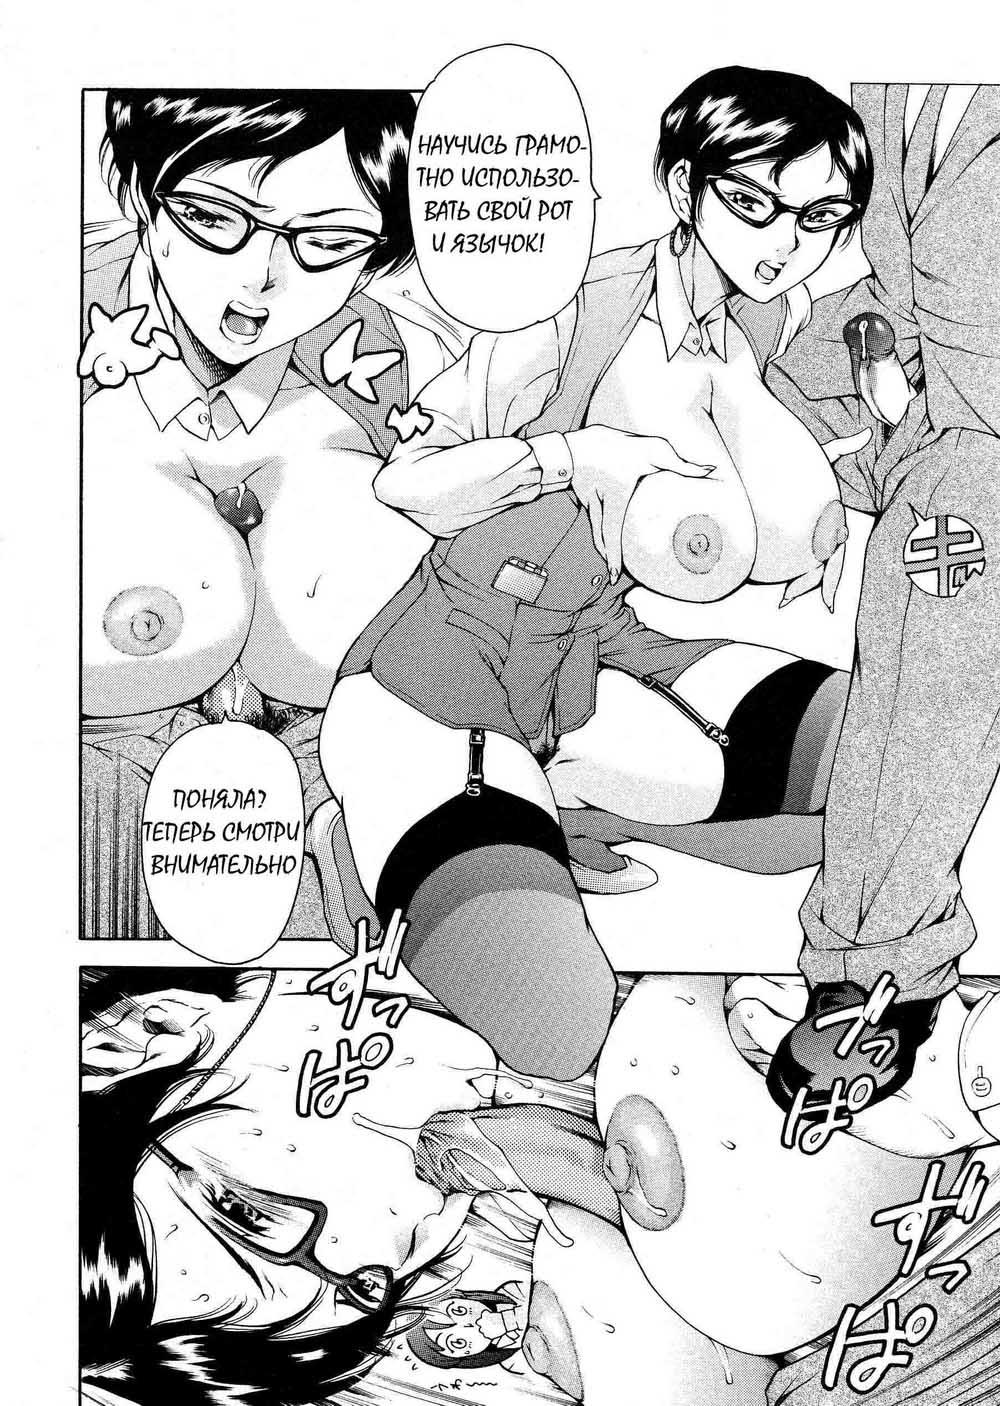 Манга   Порно комиксы онлайн на русском - Page 15